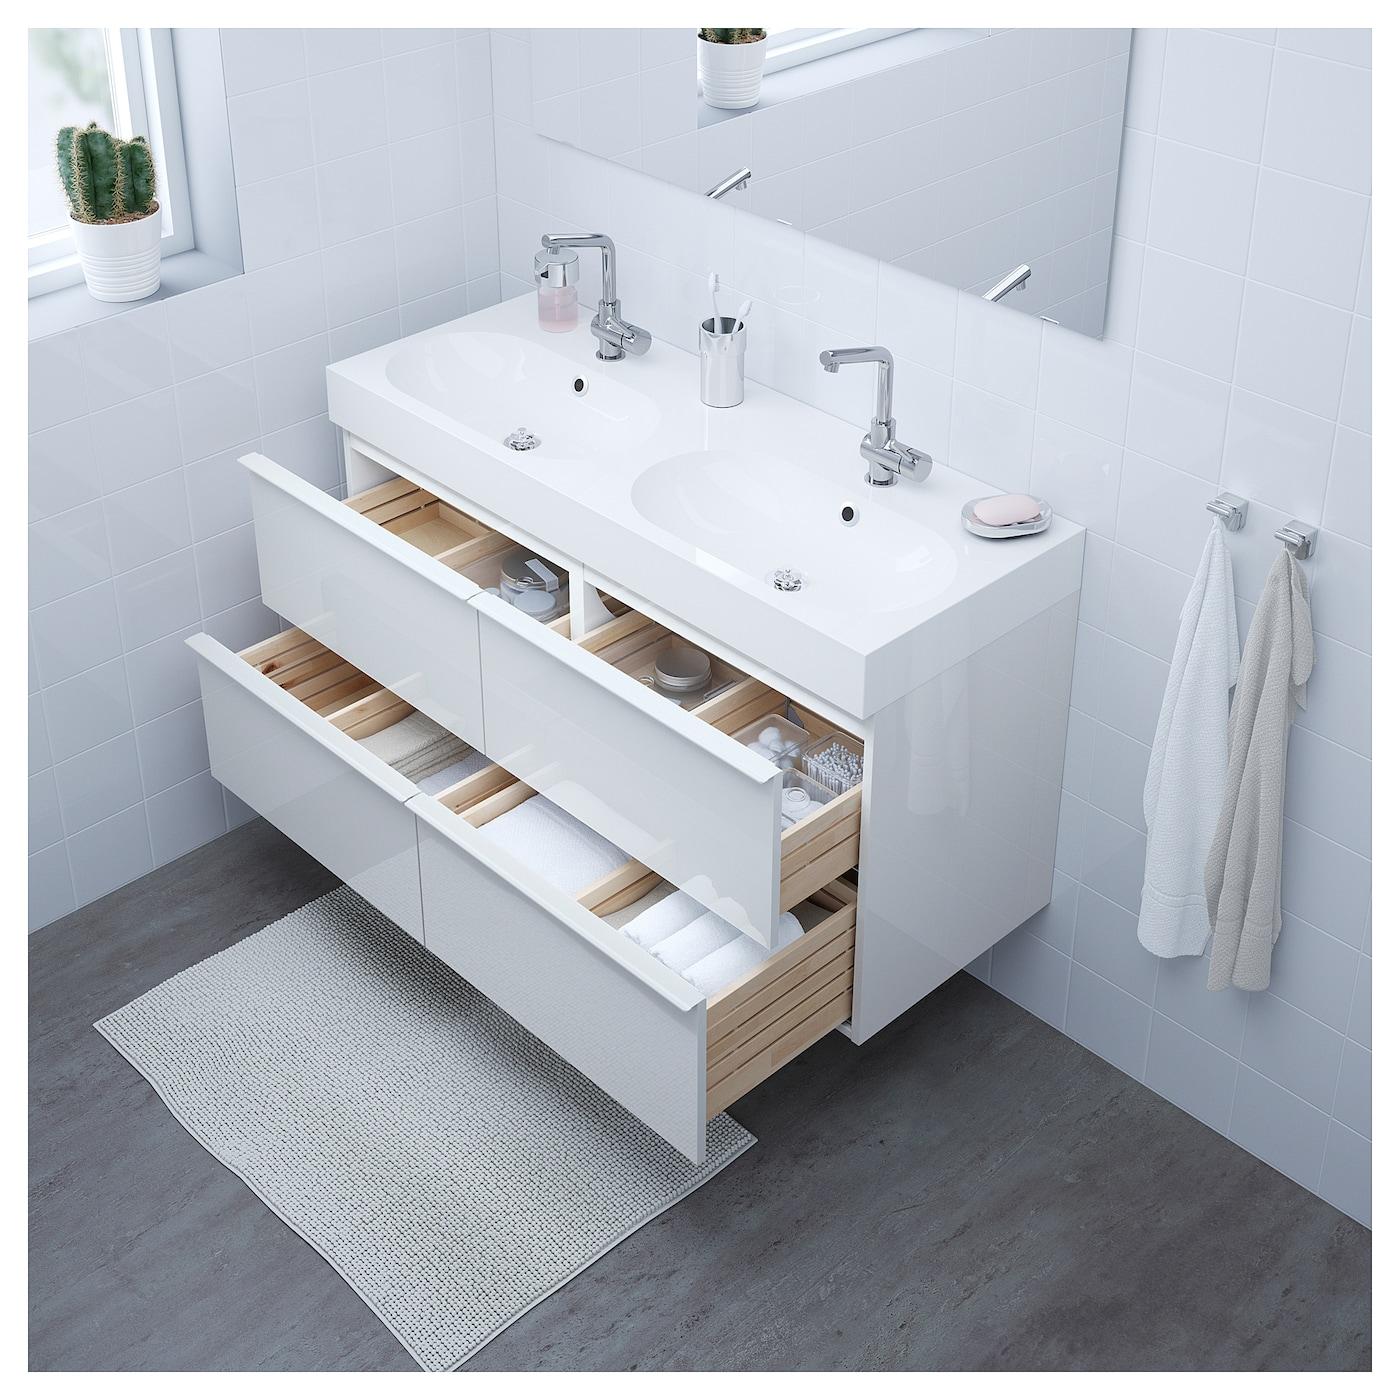 Br viken godmorgon meuble lavabo 4tir brillant blanc for Ikea meuble lavabo